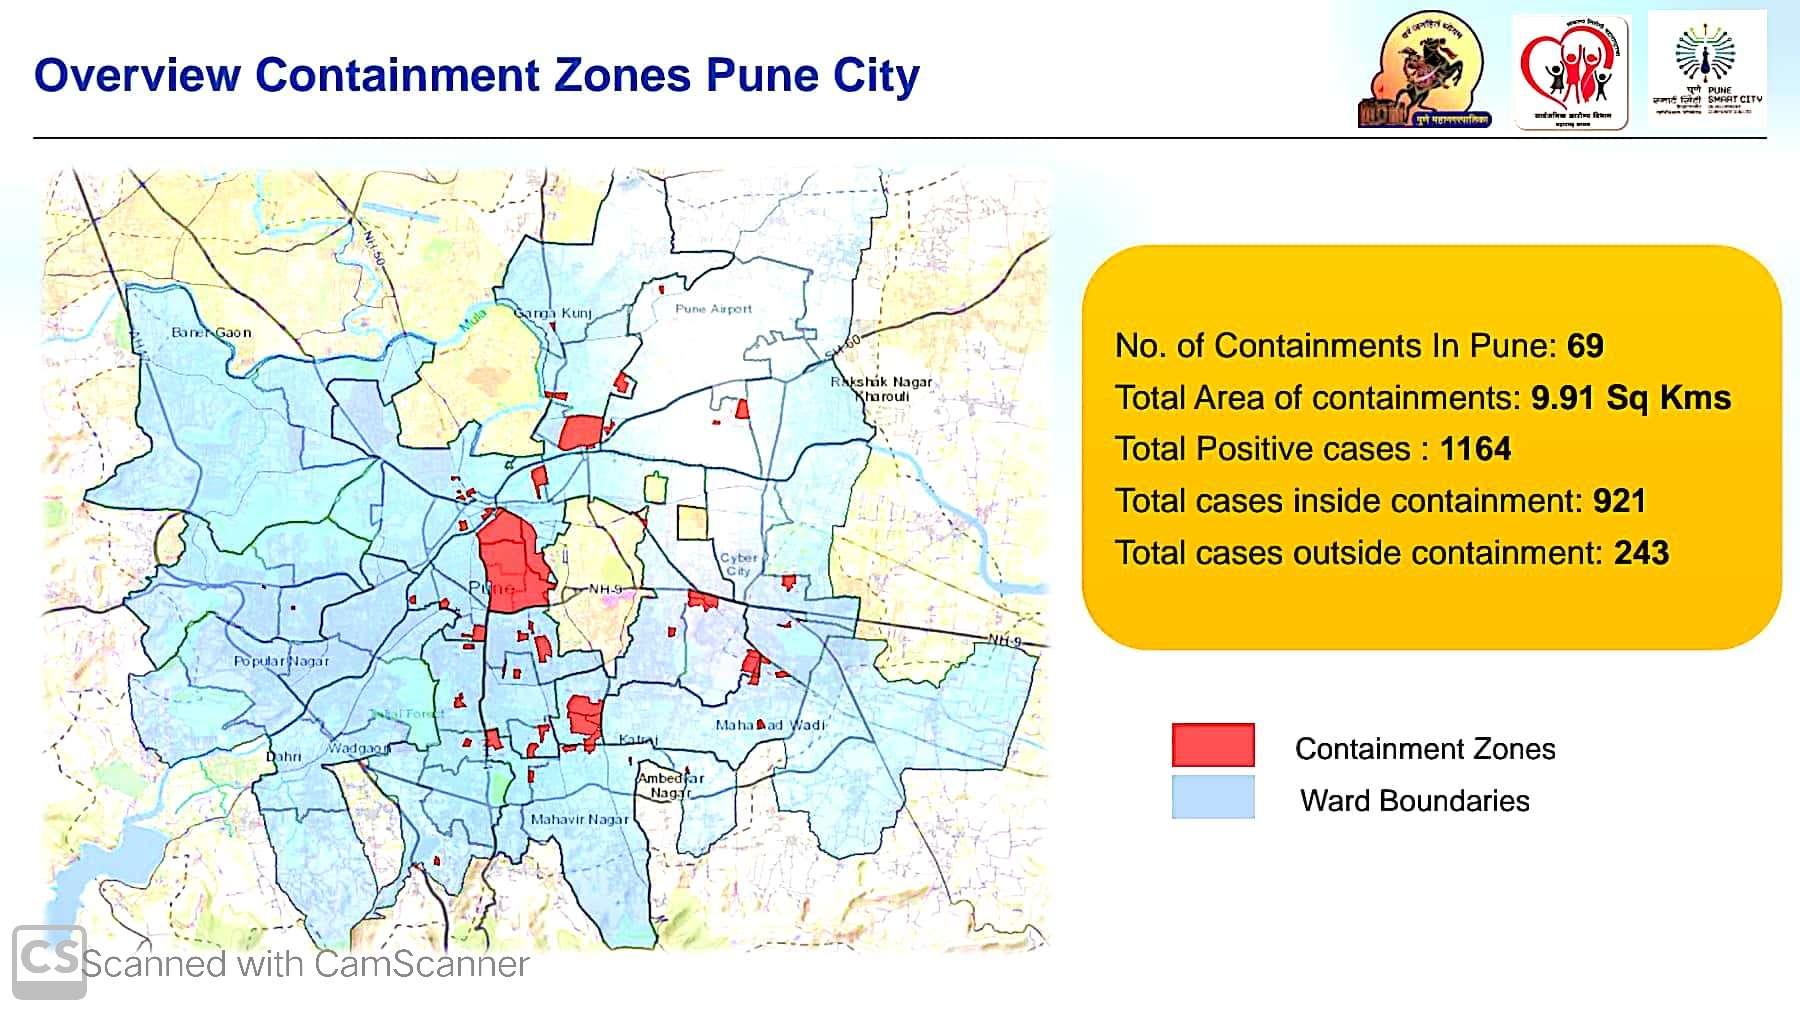 Containment zones in Pune city